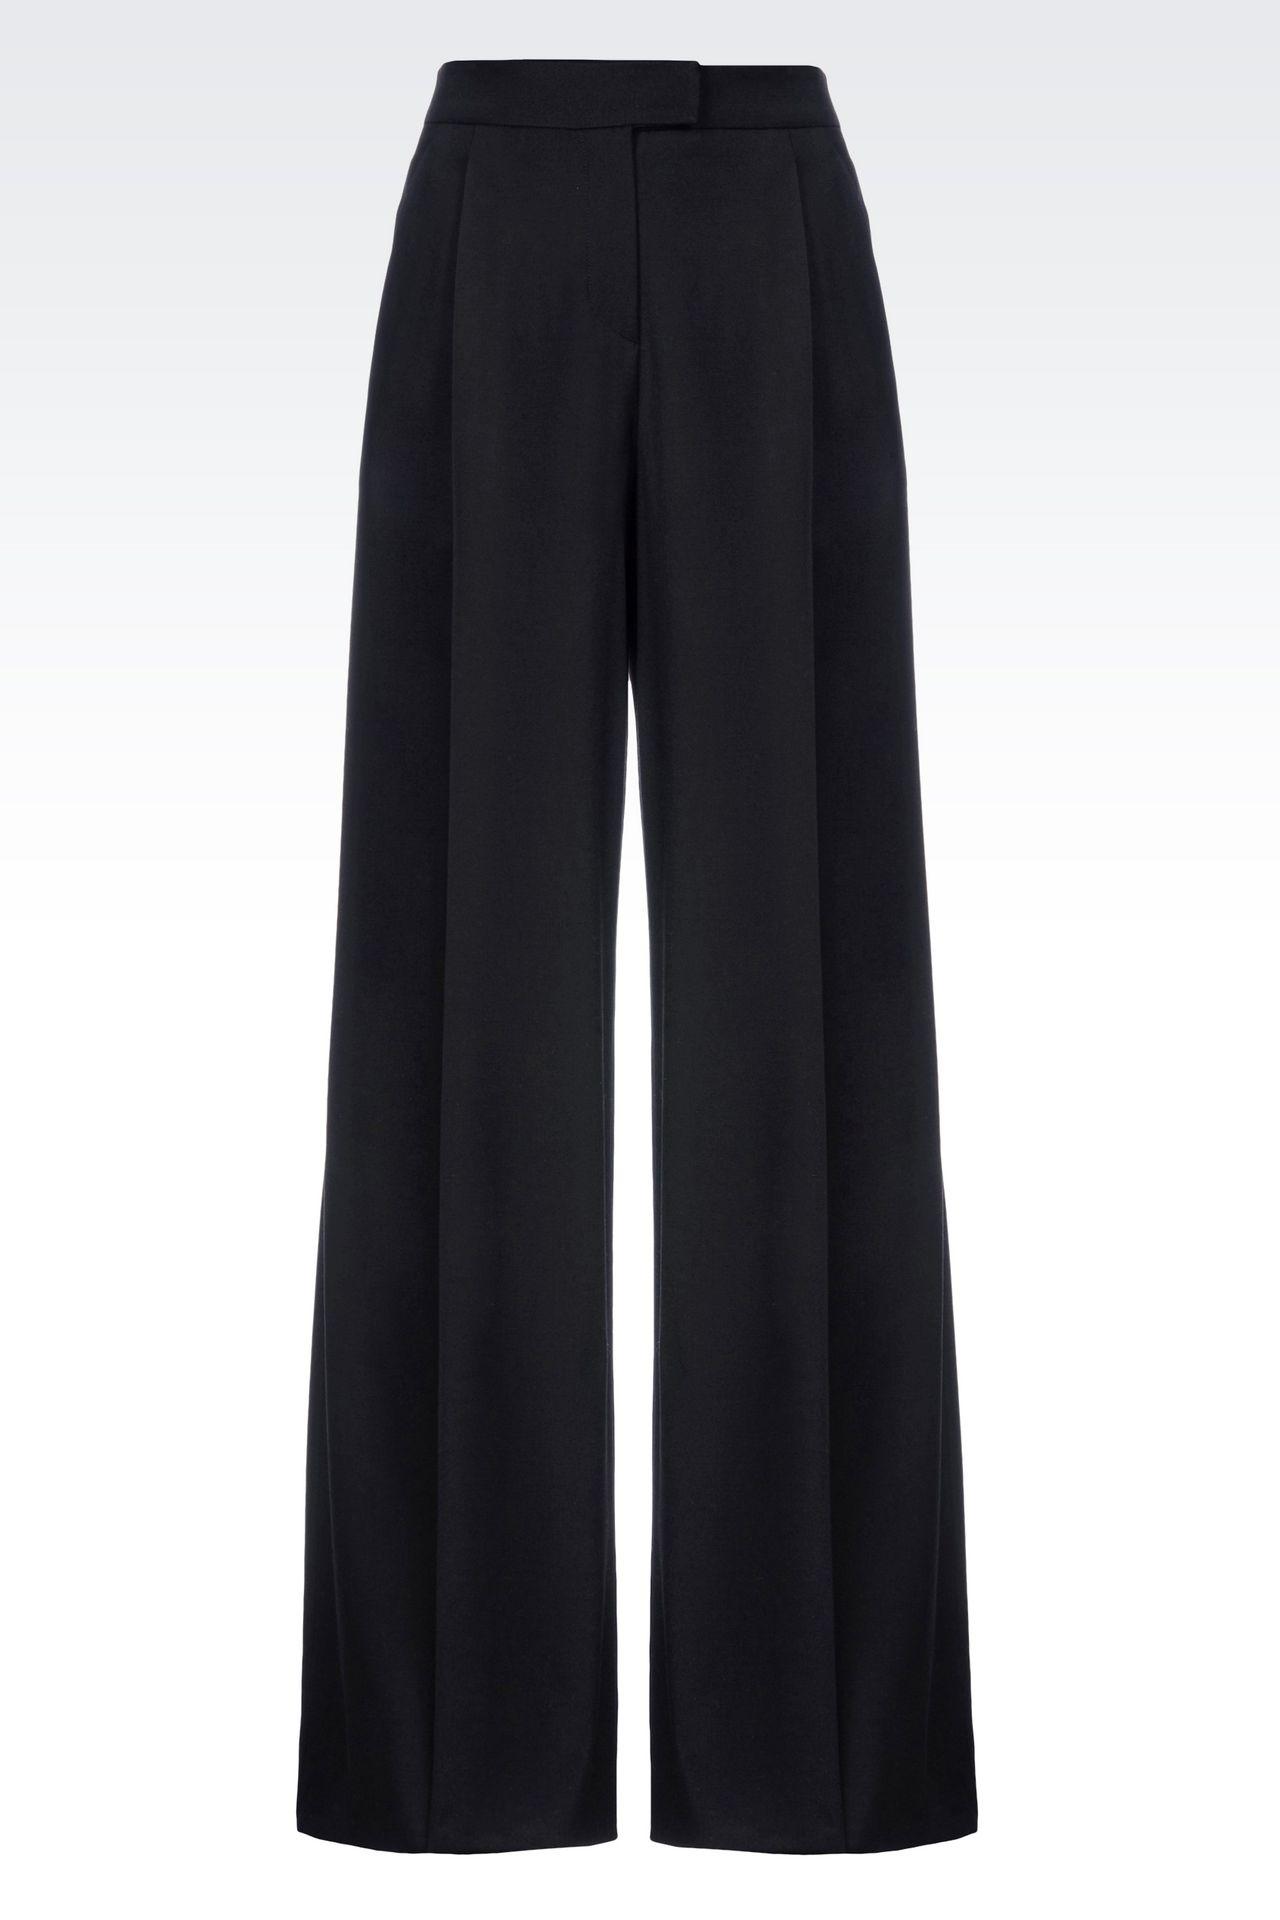 RUNWAY PALAZZO TROUSERS IN VIRGIN WOOL: Wide-leg trousers Women by Armani - 0